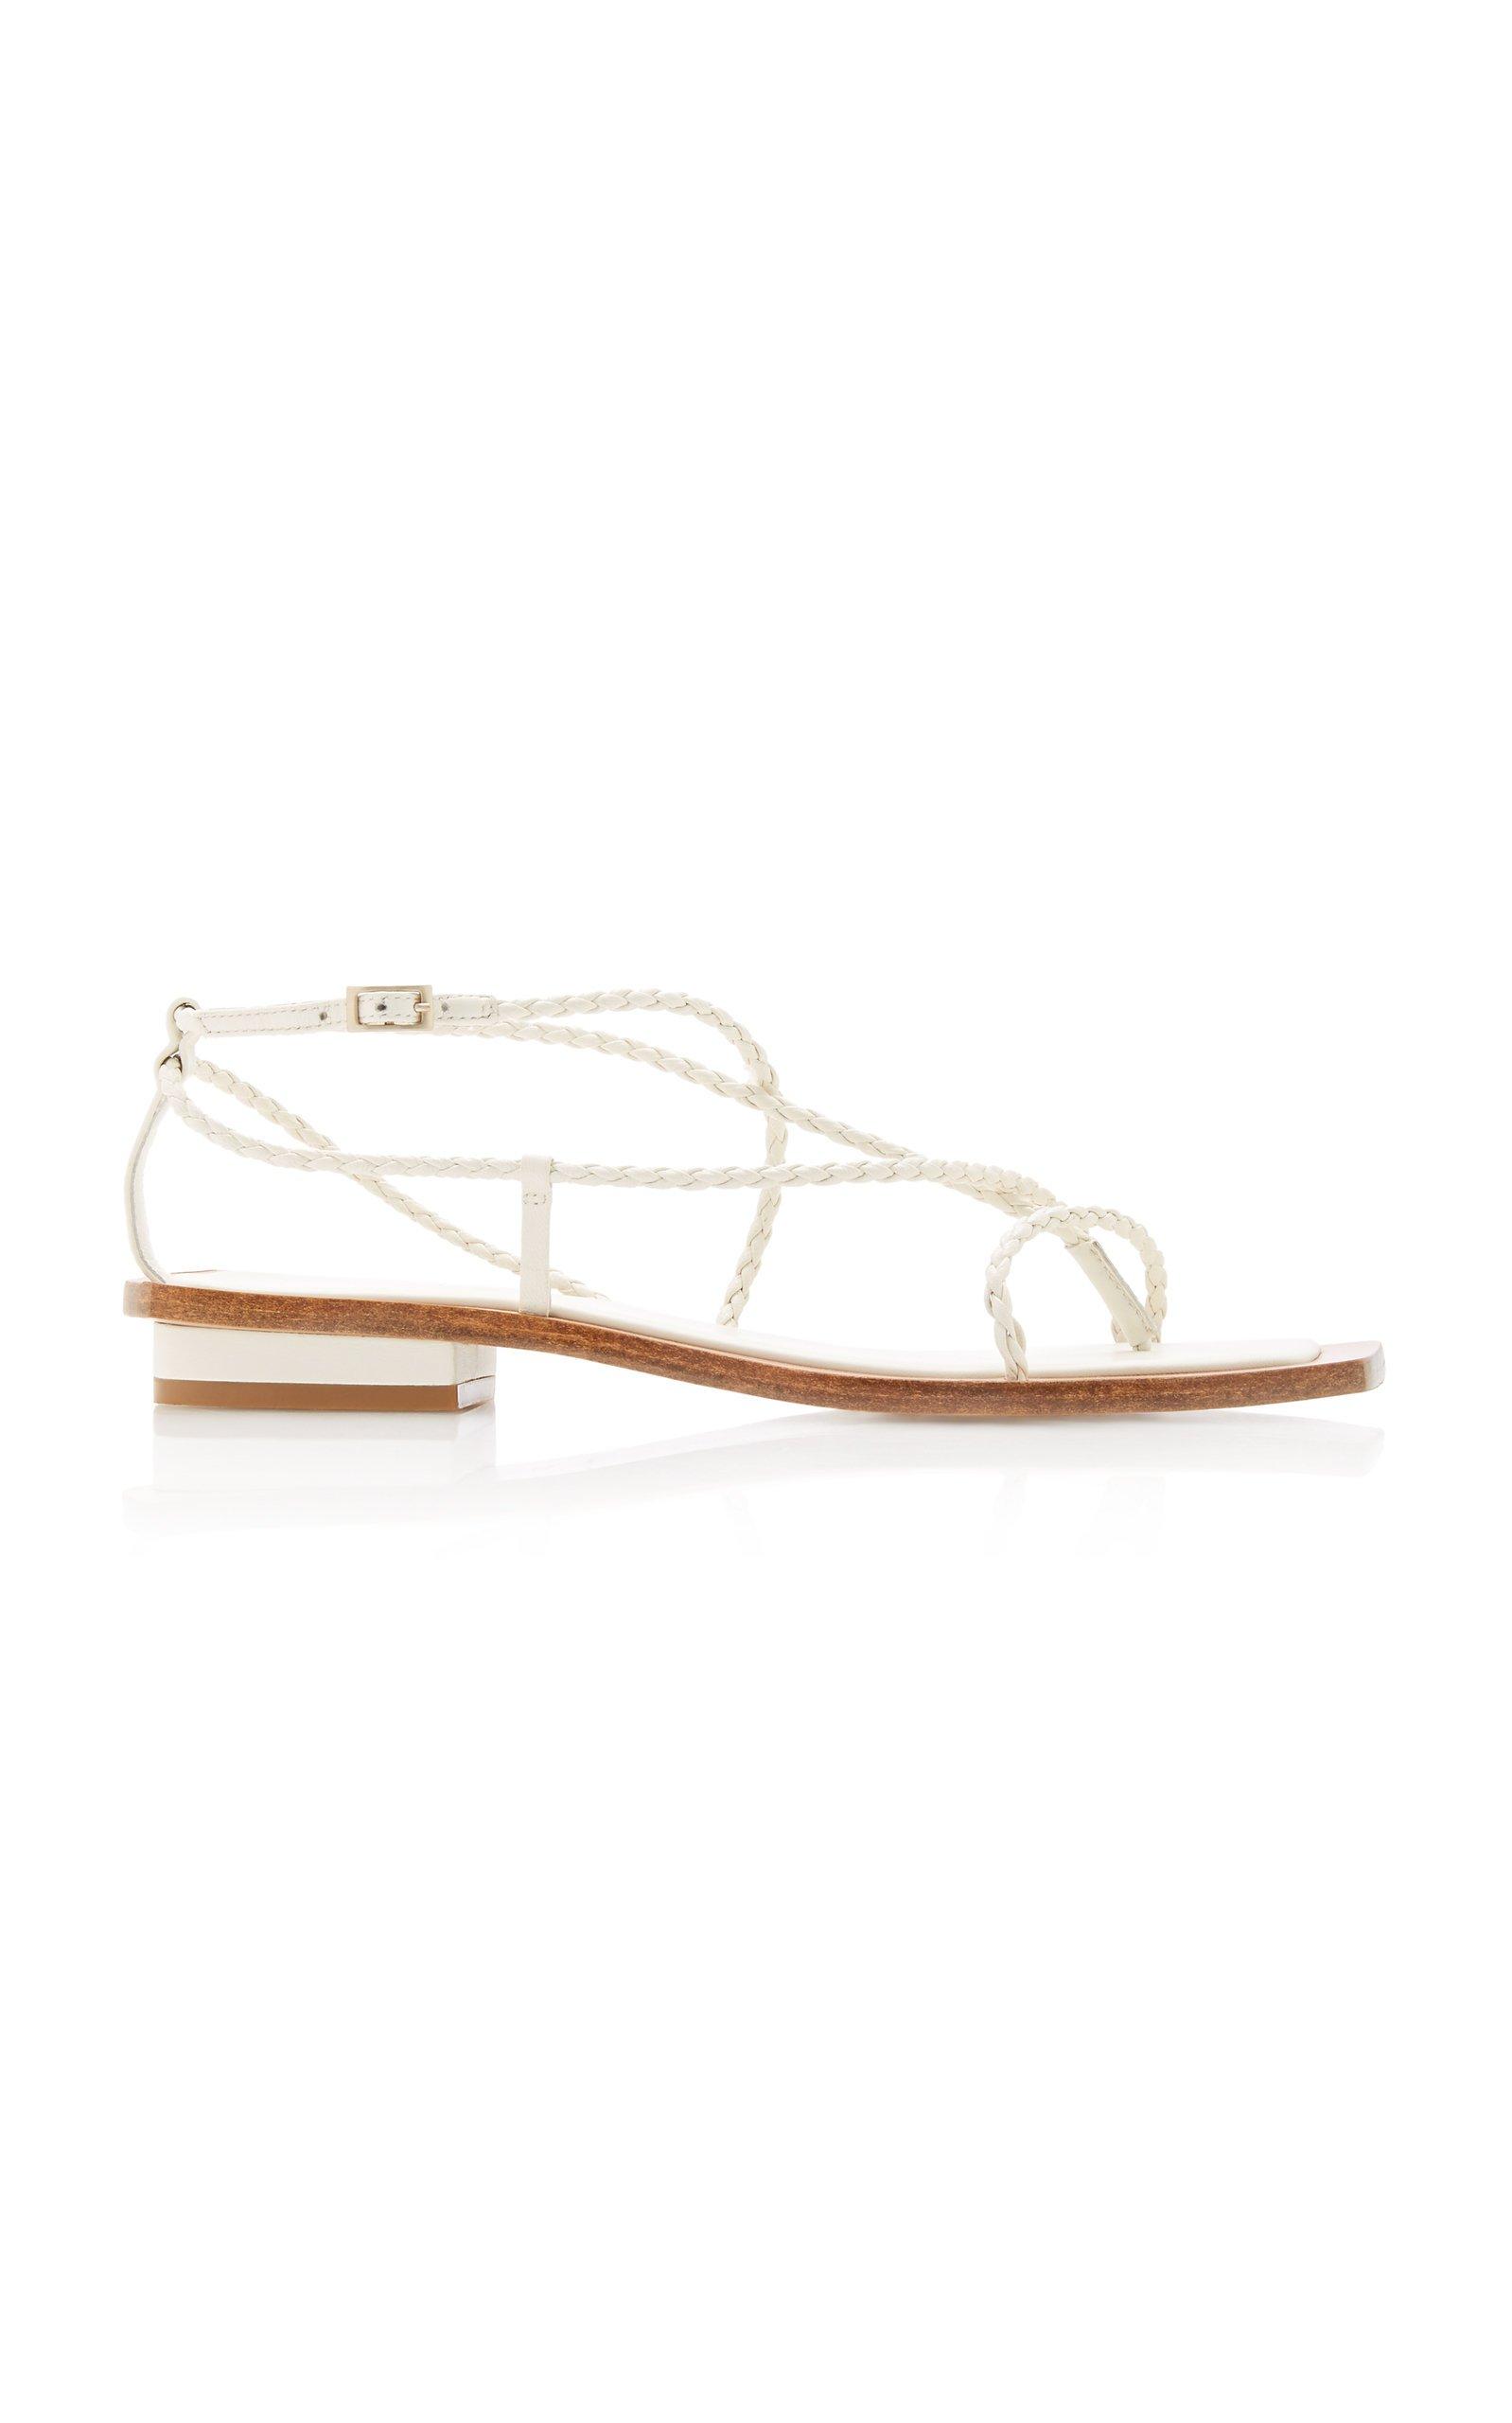 Juno Braided Sandals by Cult Gaia | Moda Operandi